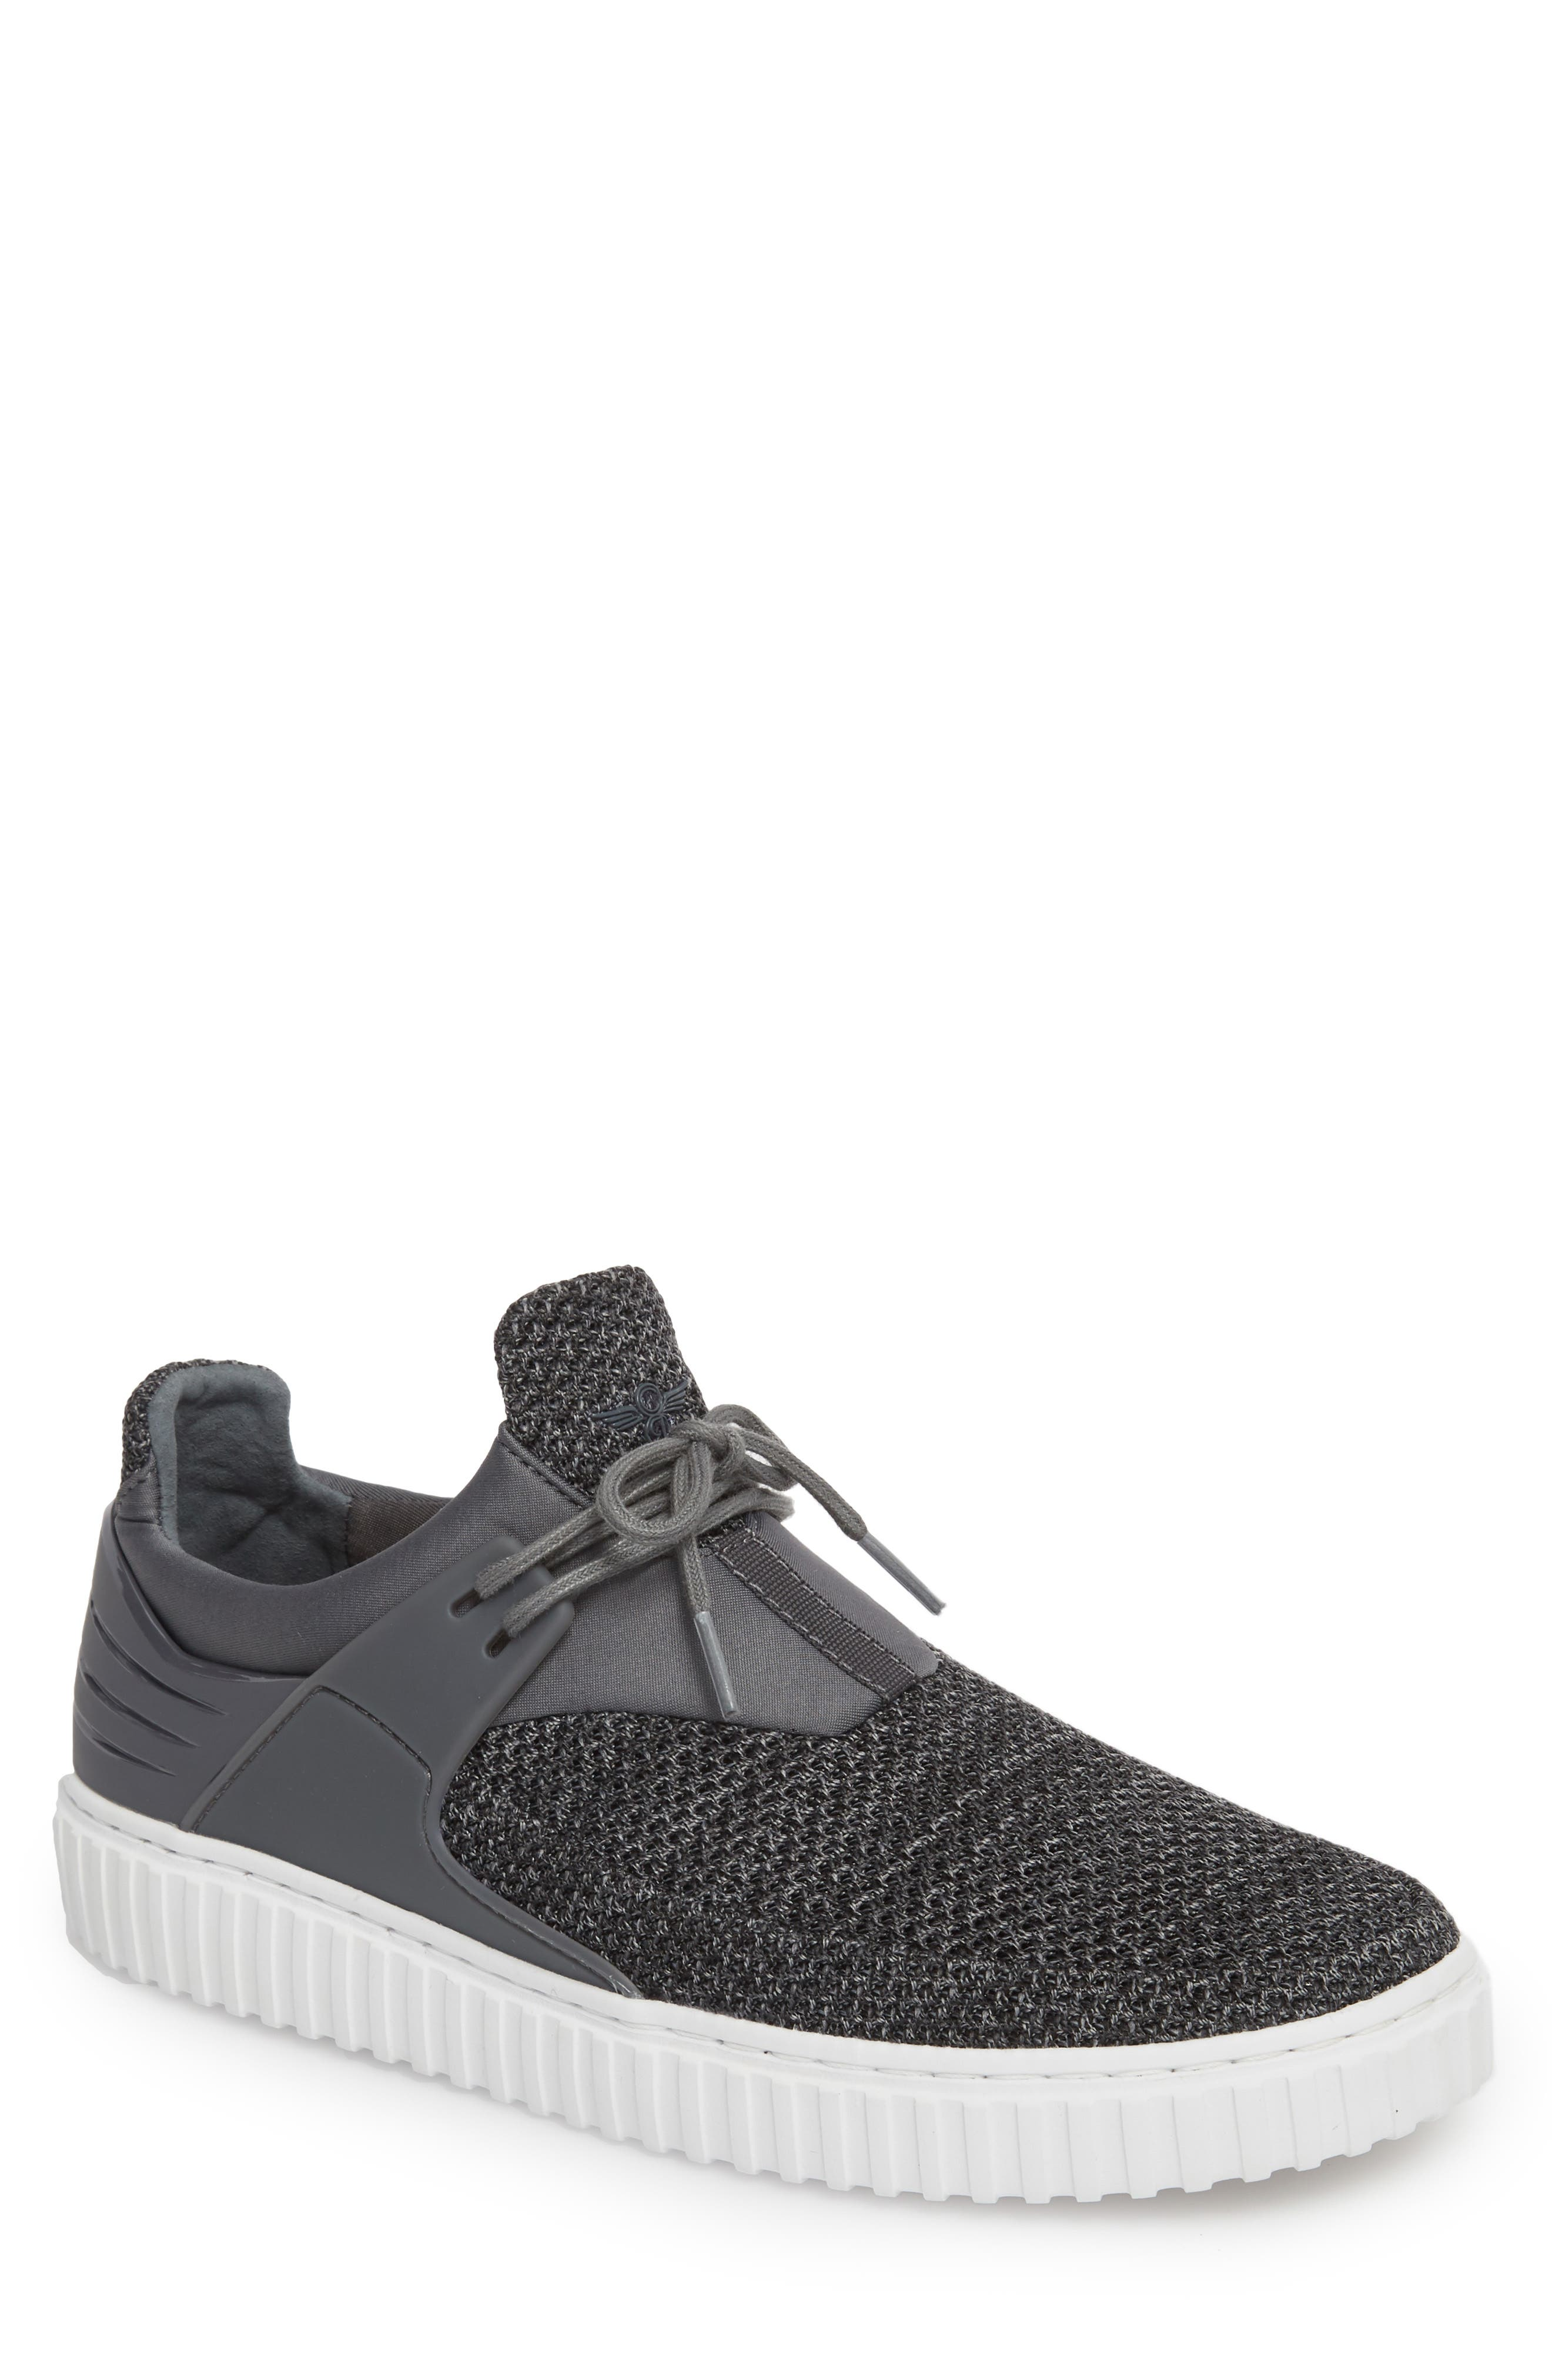 Castucci Knit Sneaker,                         Main,                         color, 021